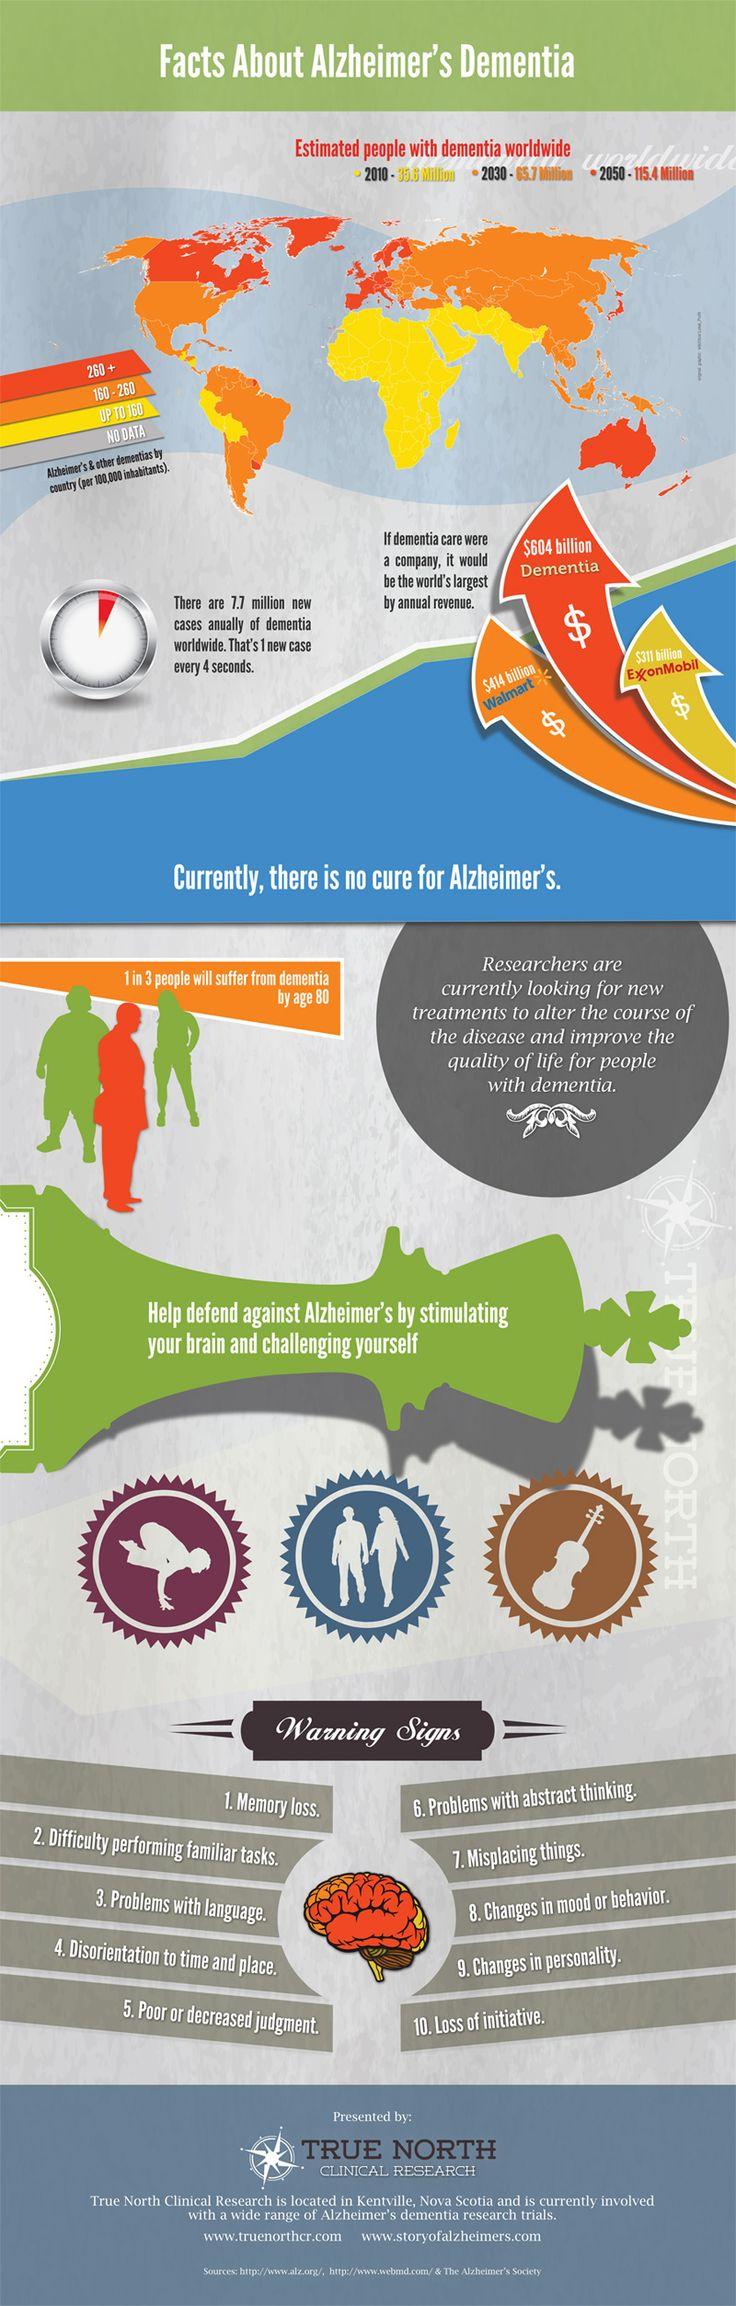 Facts About Alzheimer's Dementia – Infographic #alzheimers #tgen #mindcrowd www.mindcrowd.org